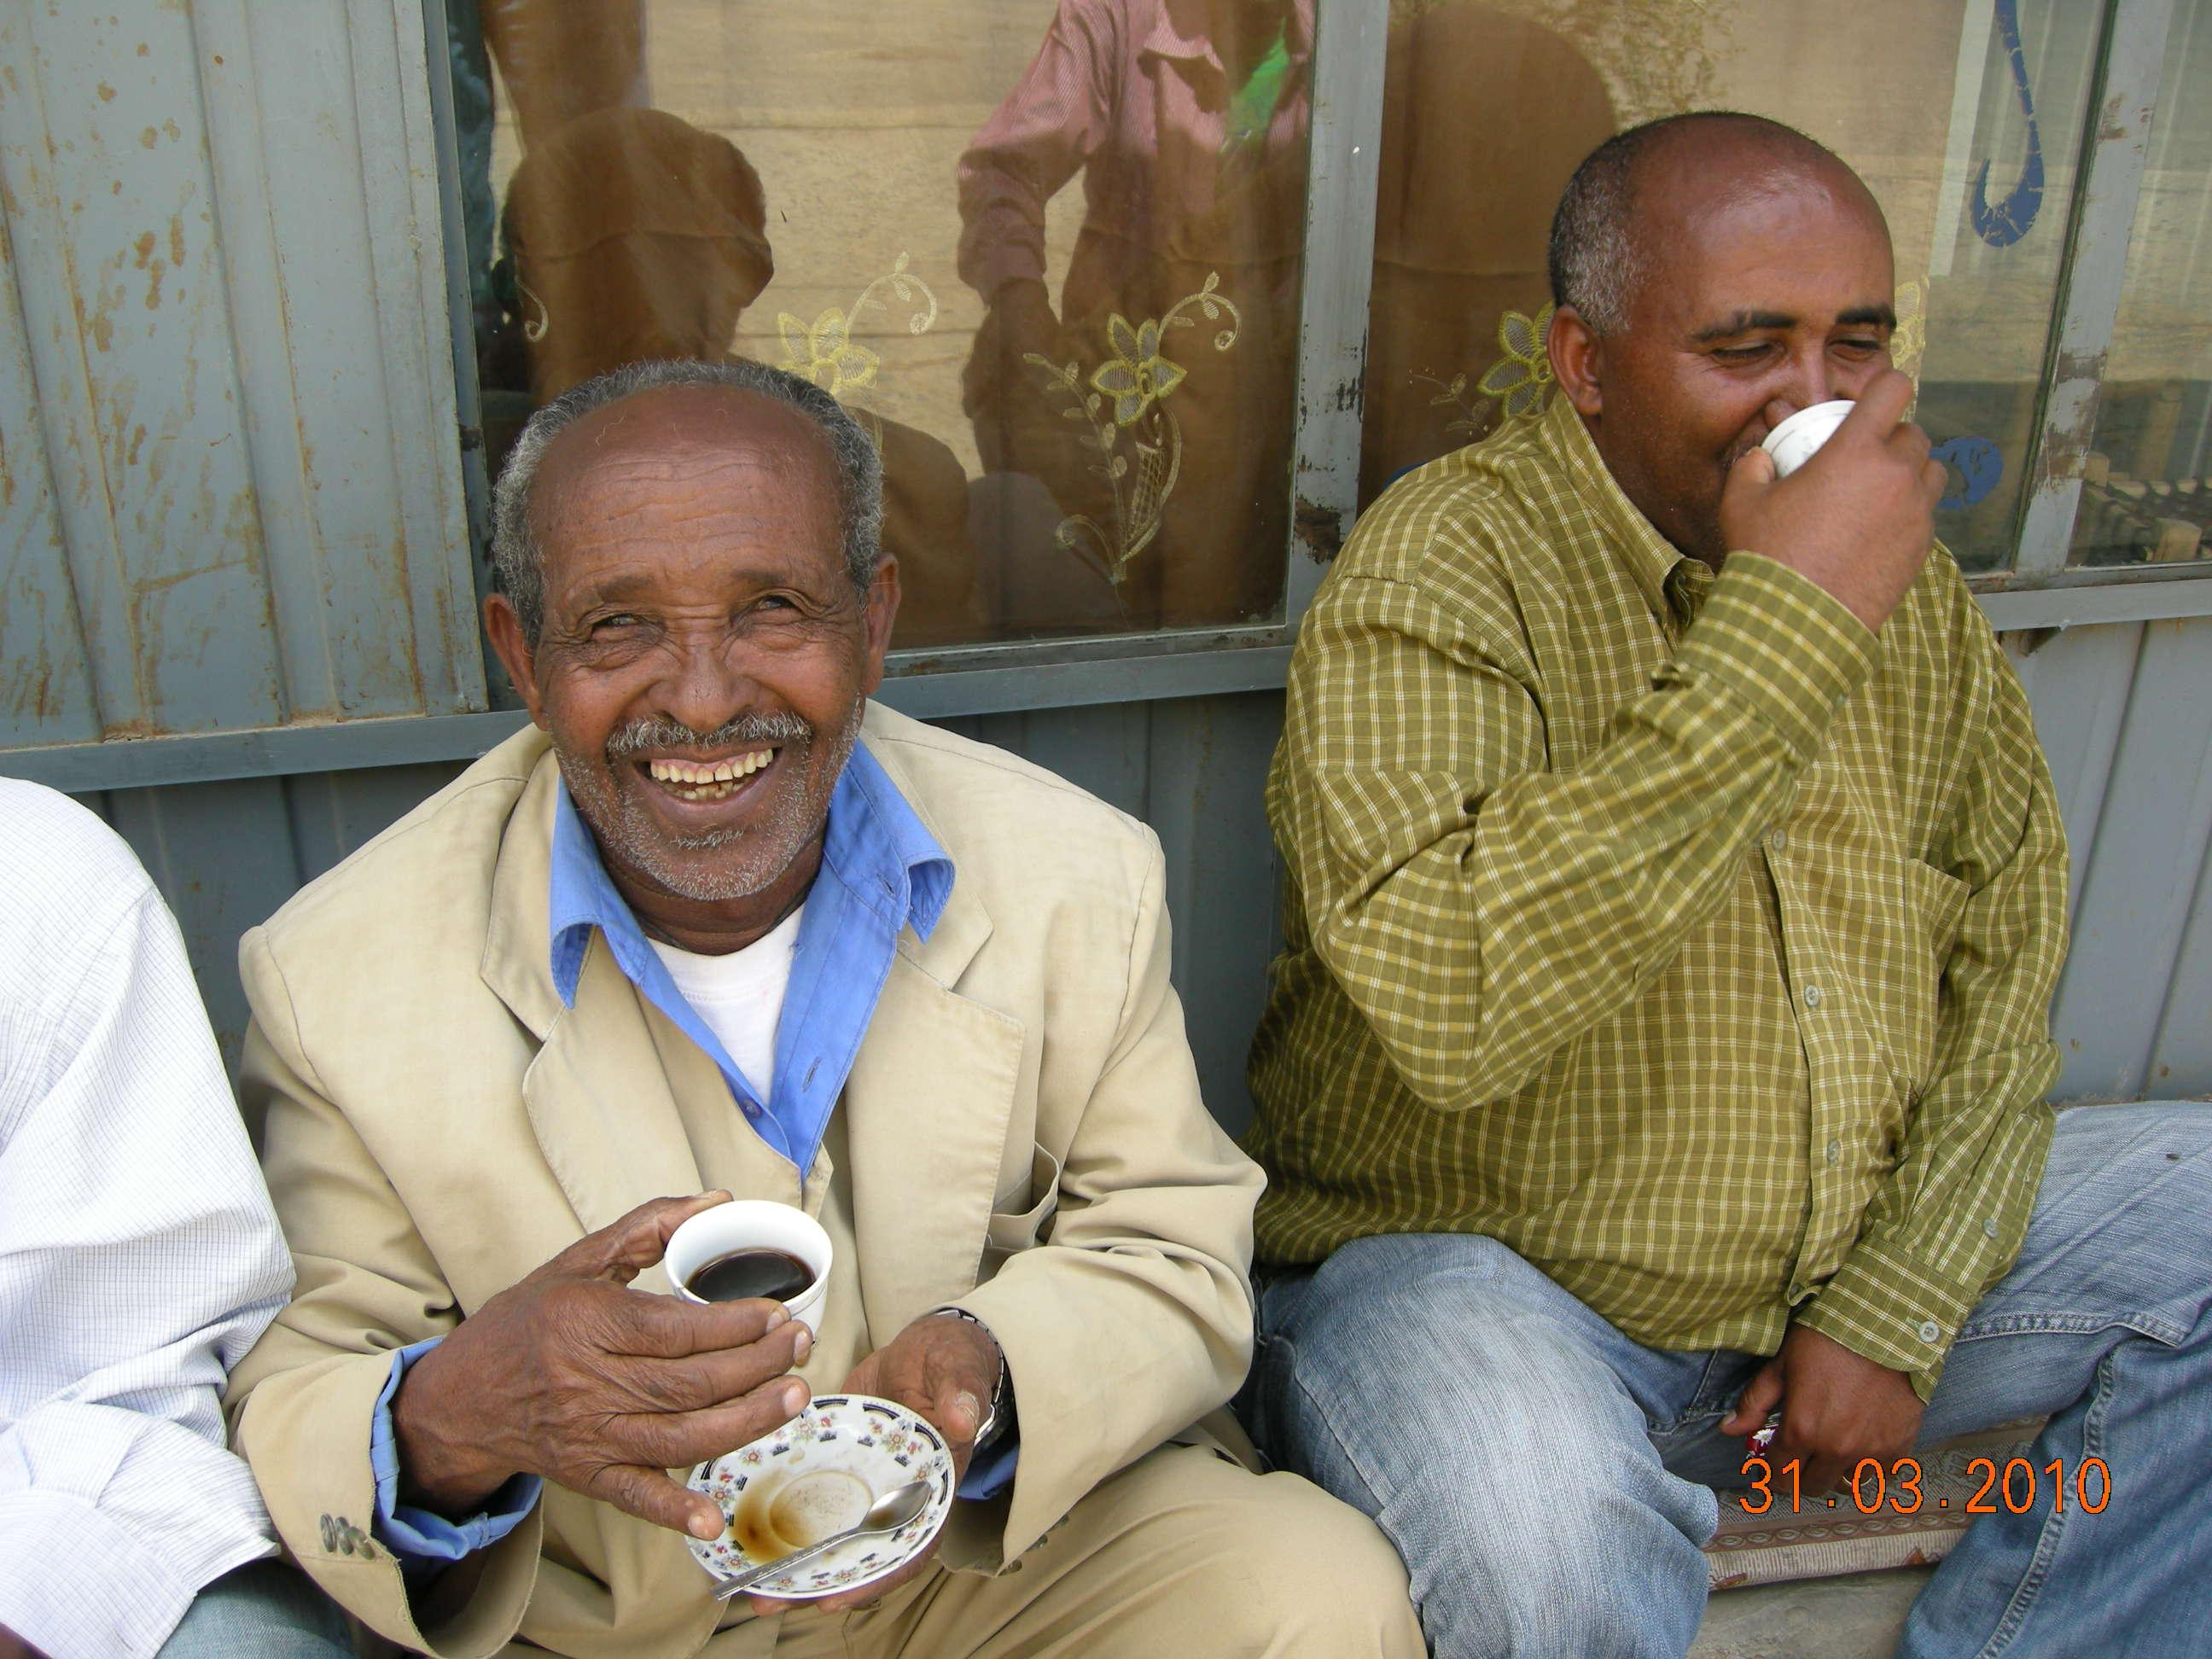 Äthiopien Reisen individuell Irobland